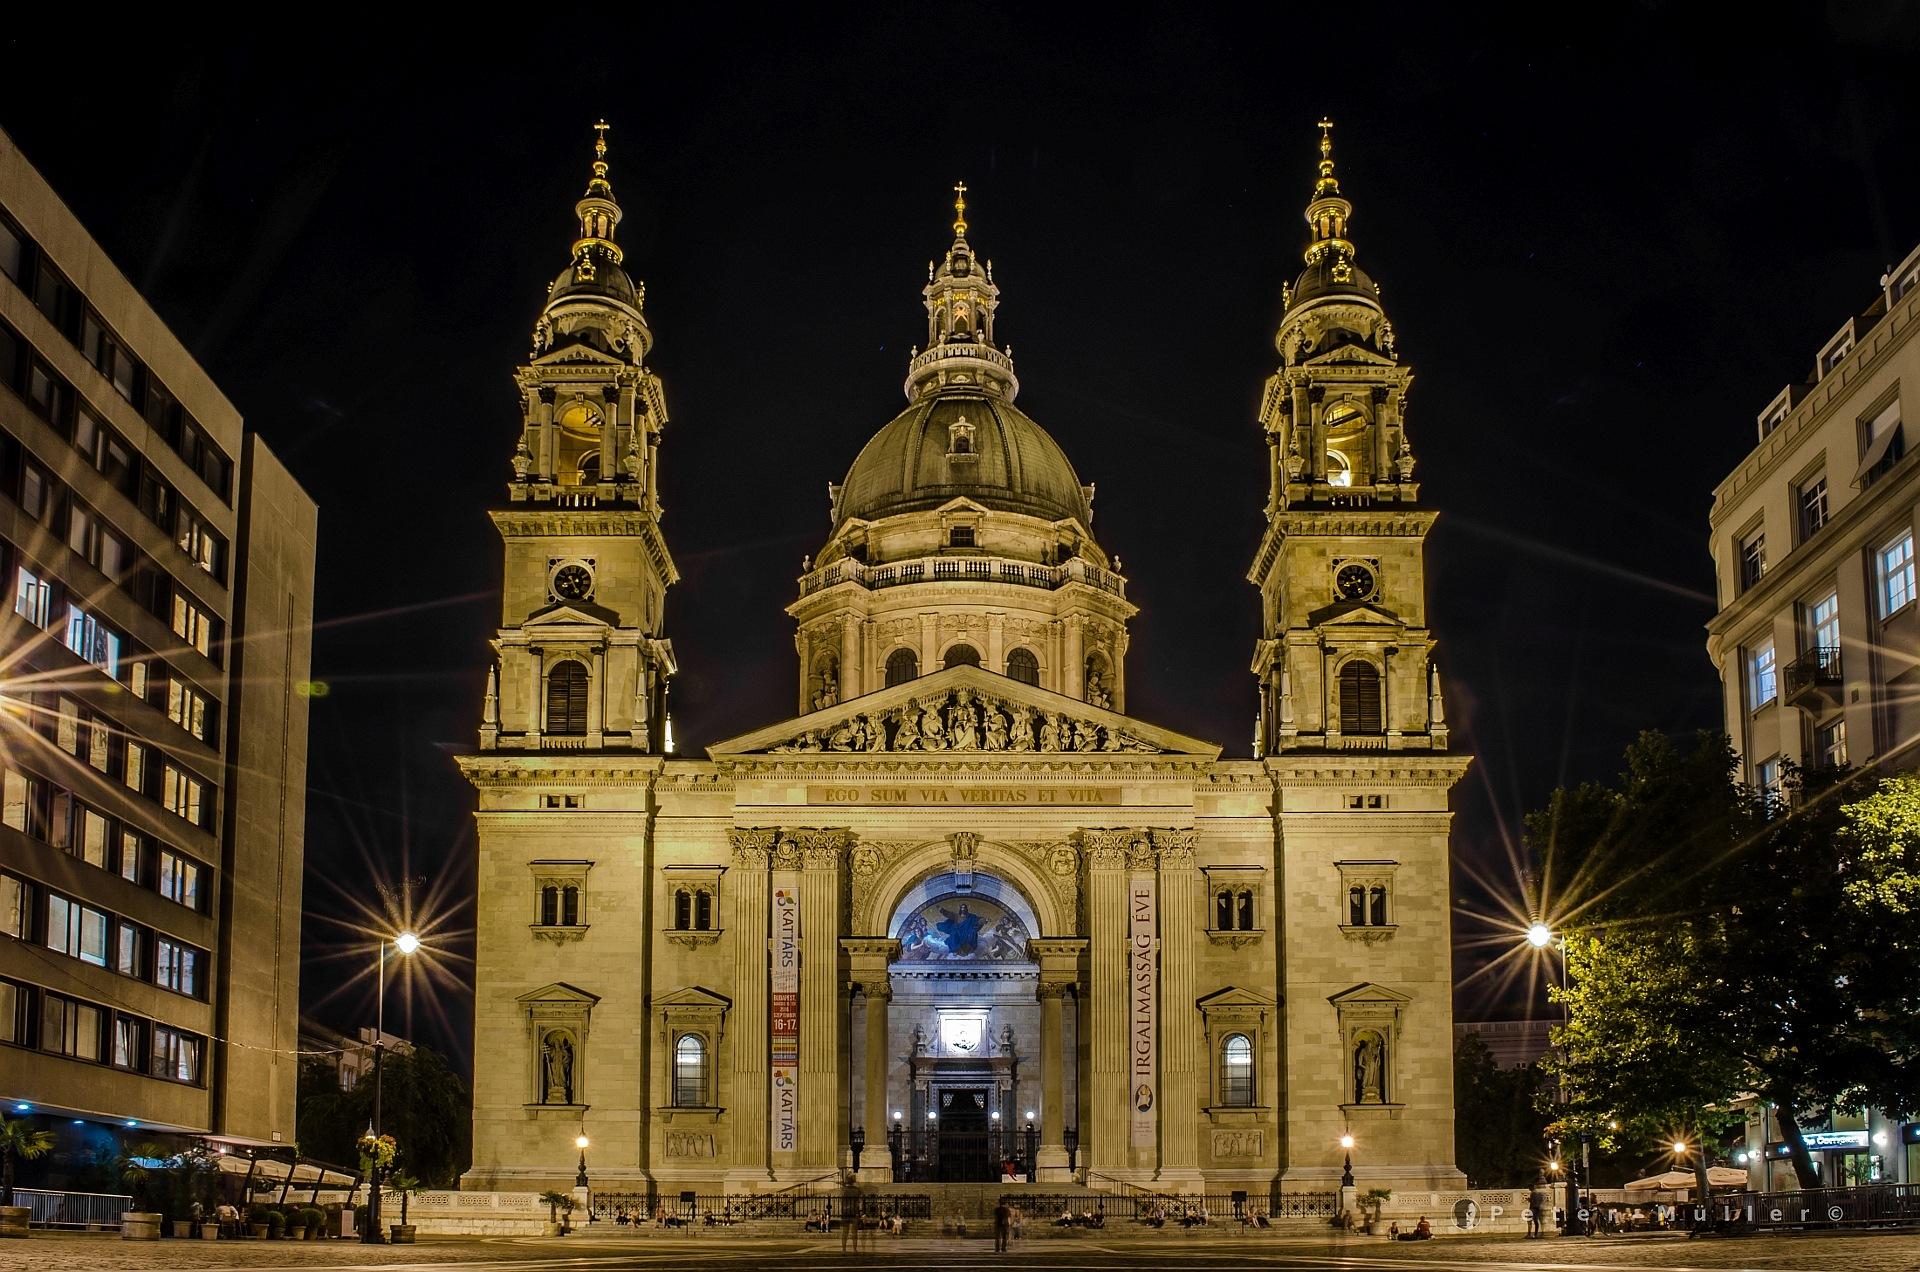 St.-Stephans-Basilika Budapest by Peter Müller